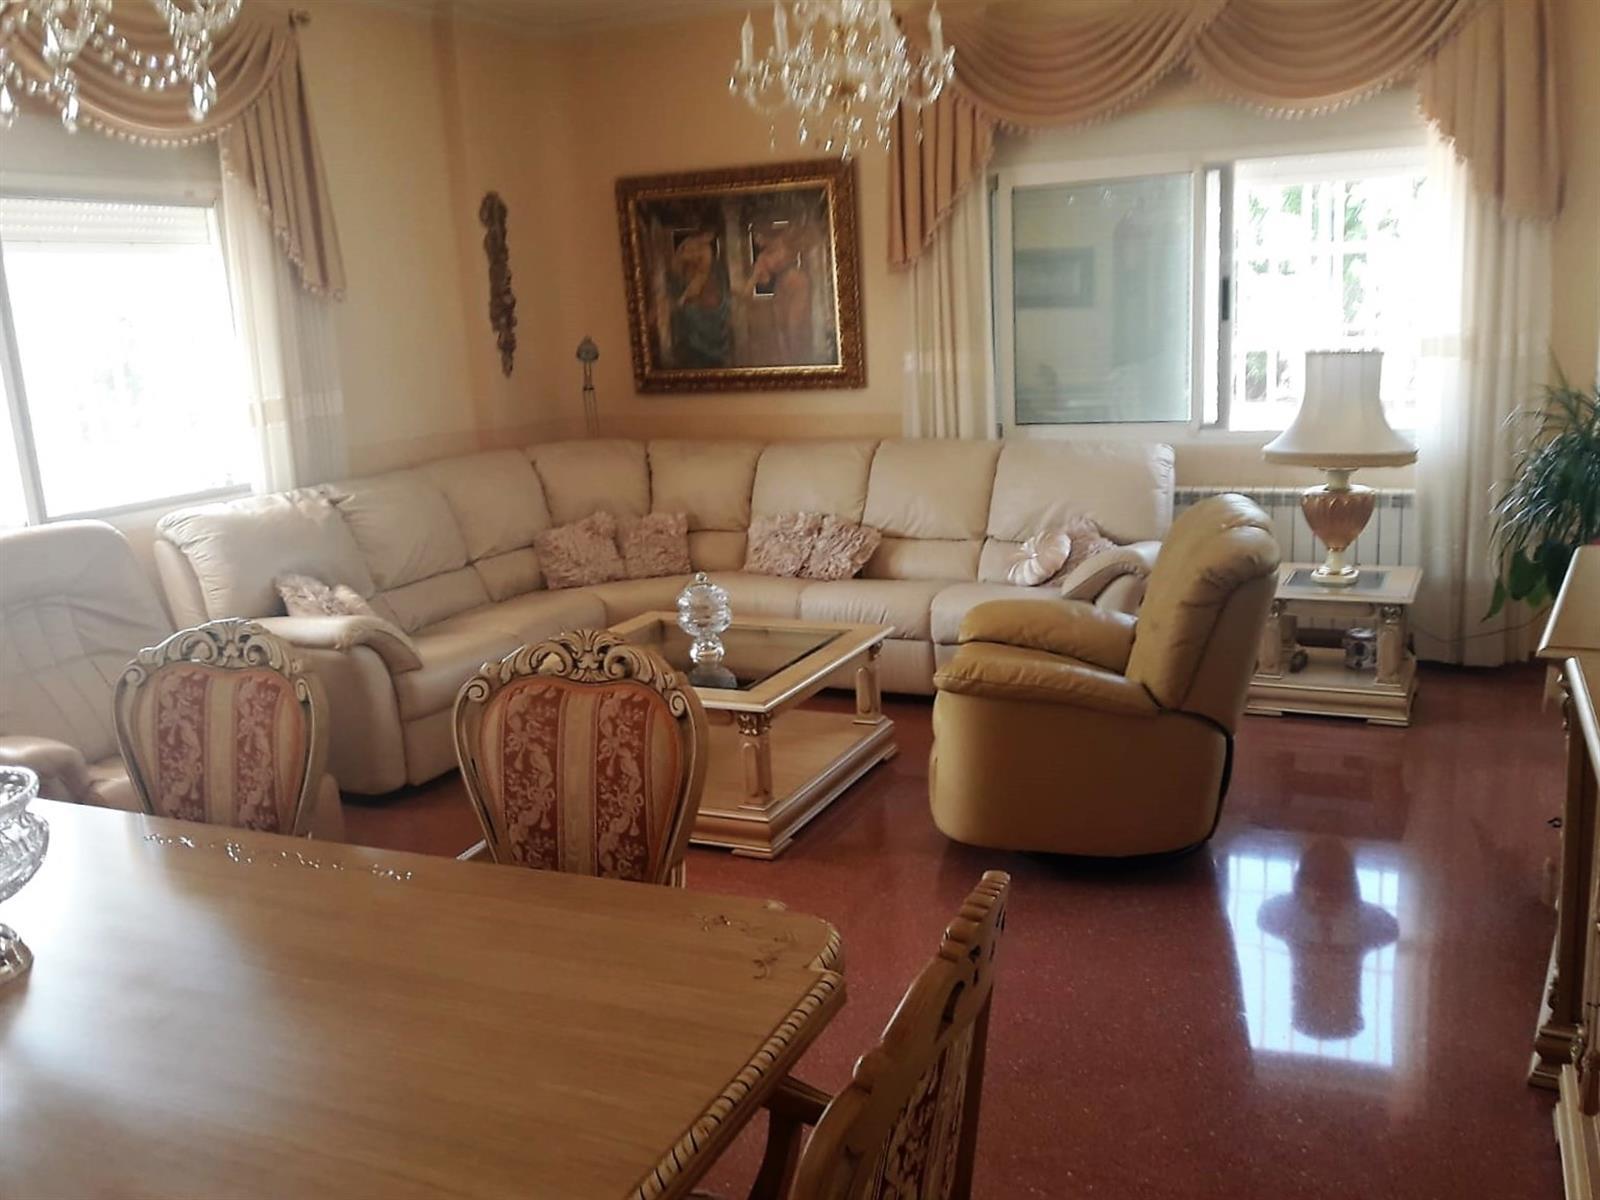 Maison - Murcia - #4134055-6